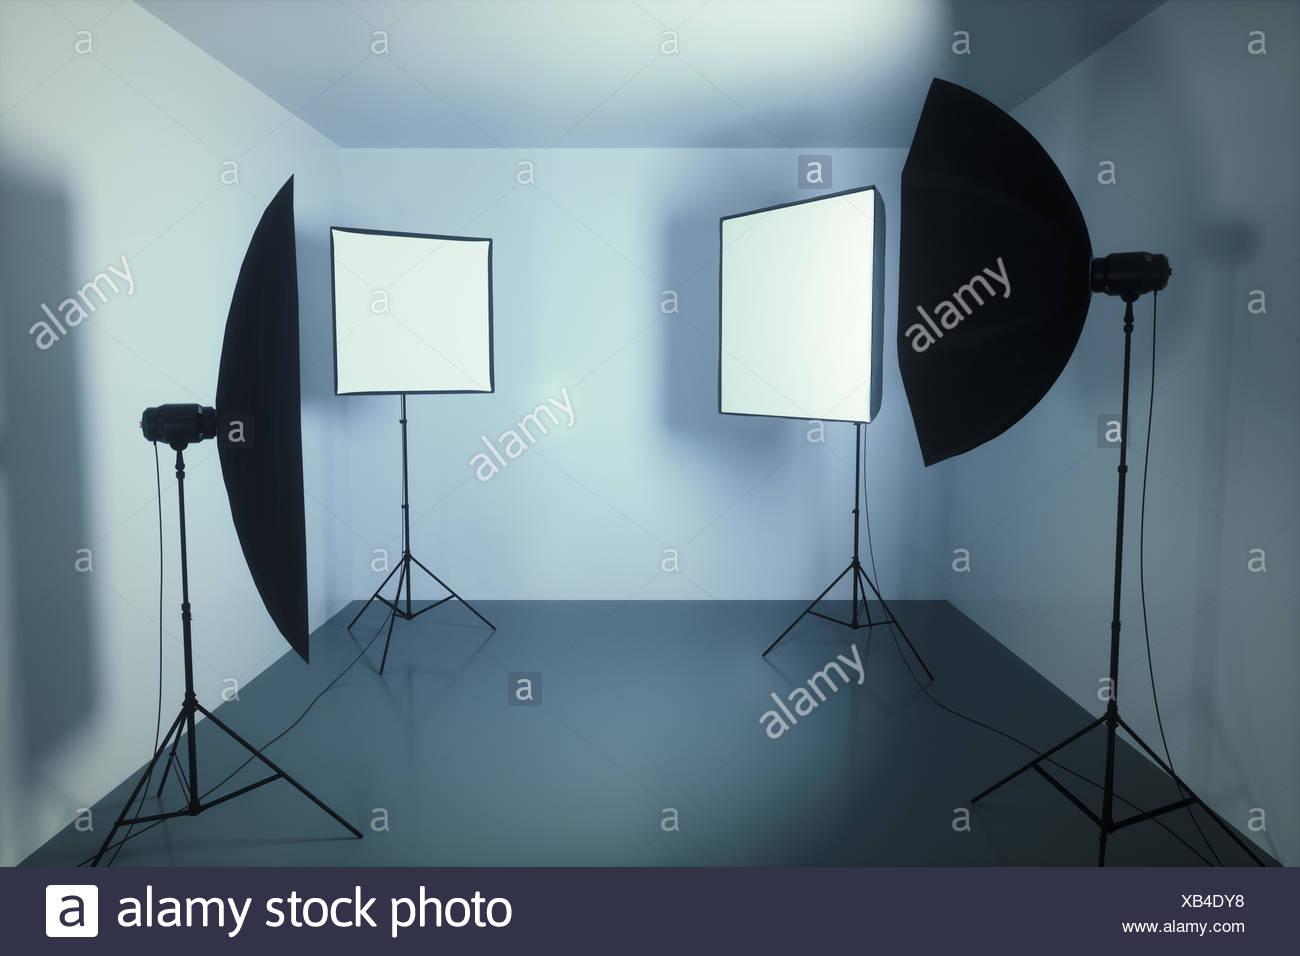 Photography studio, illustration. - Stock Image